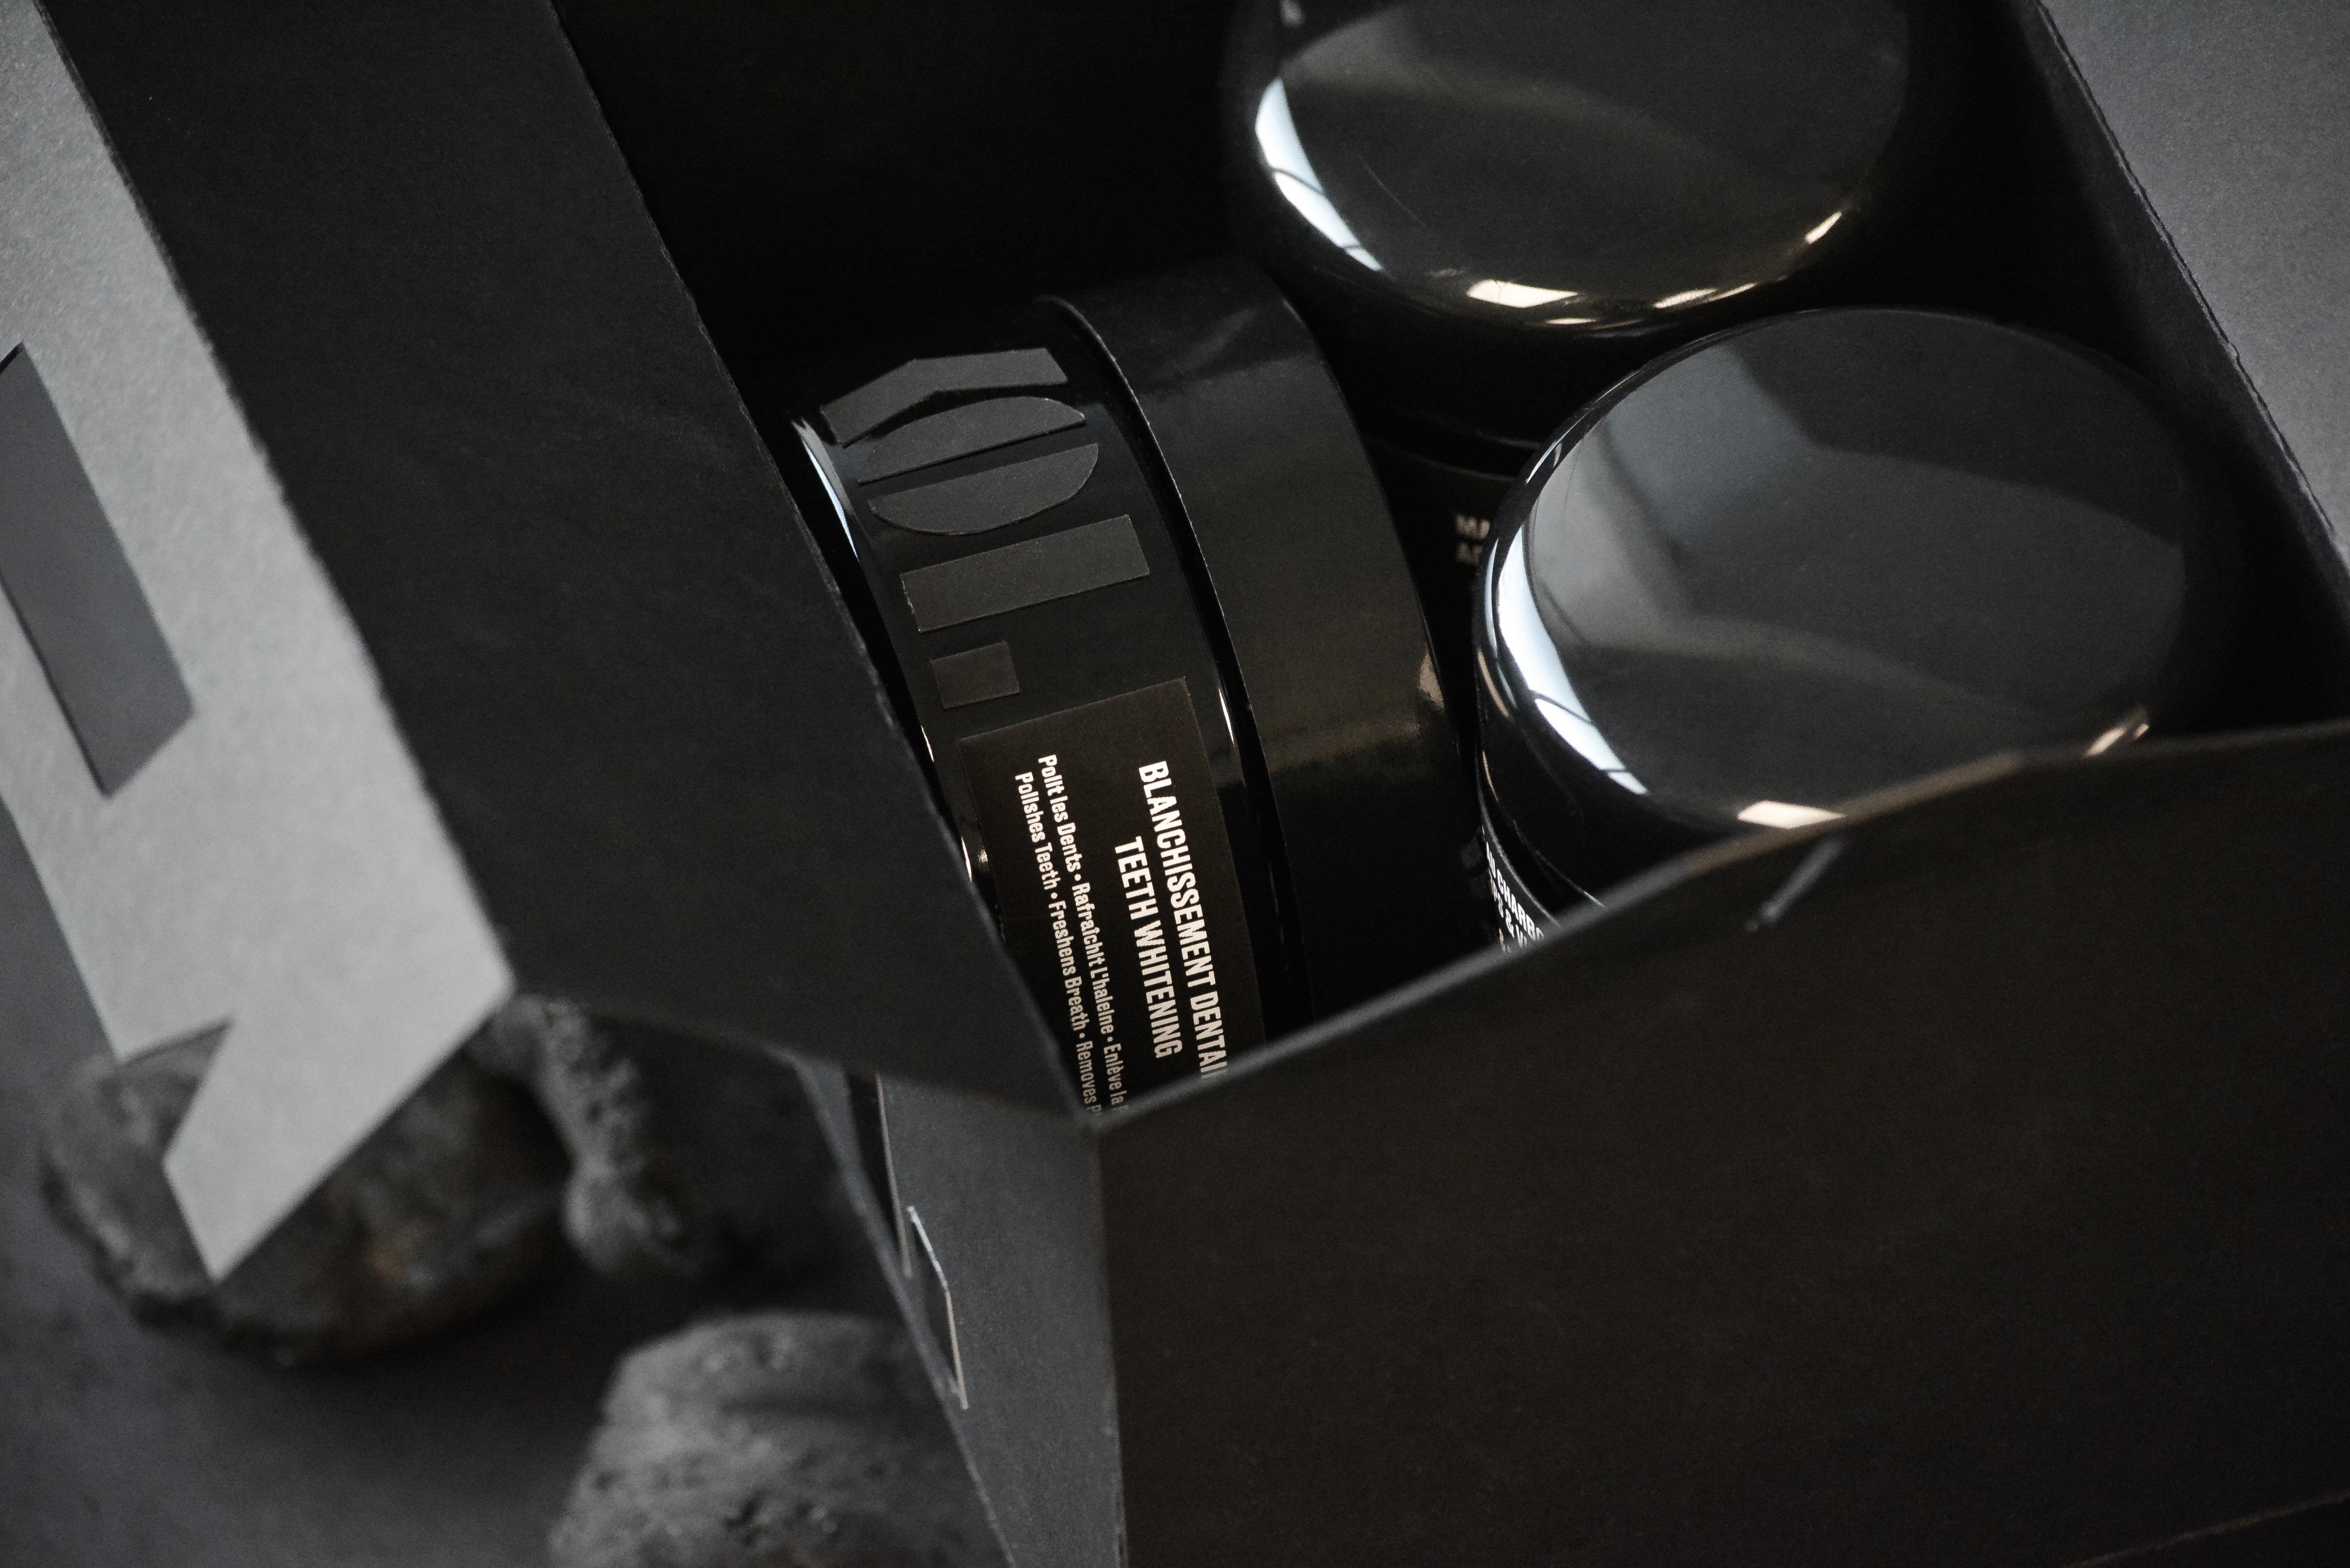 Kol bottel inside box